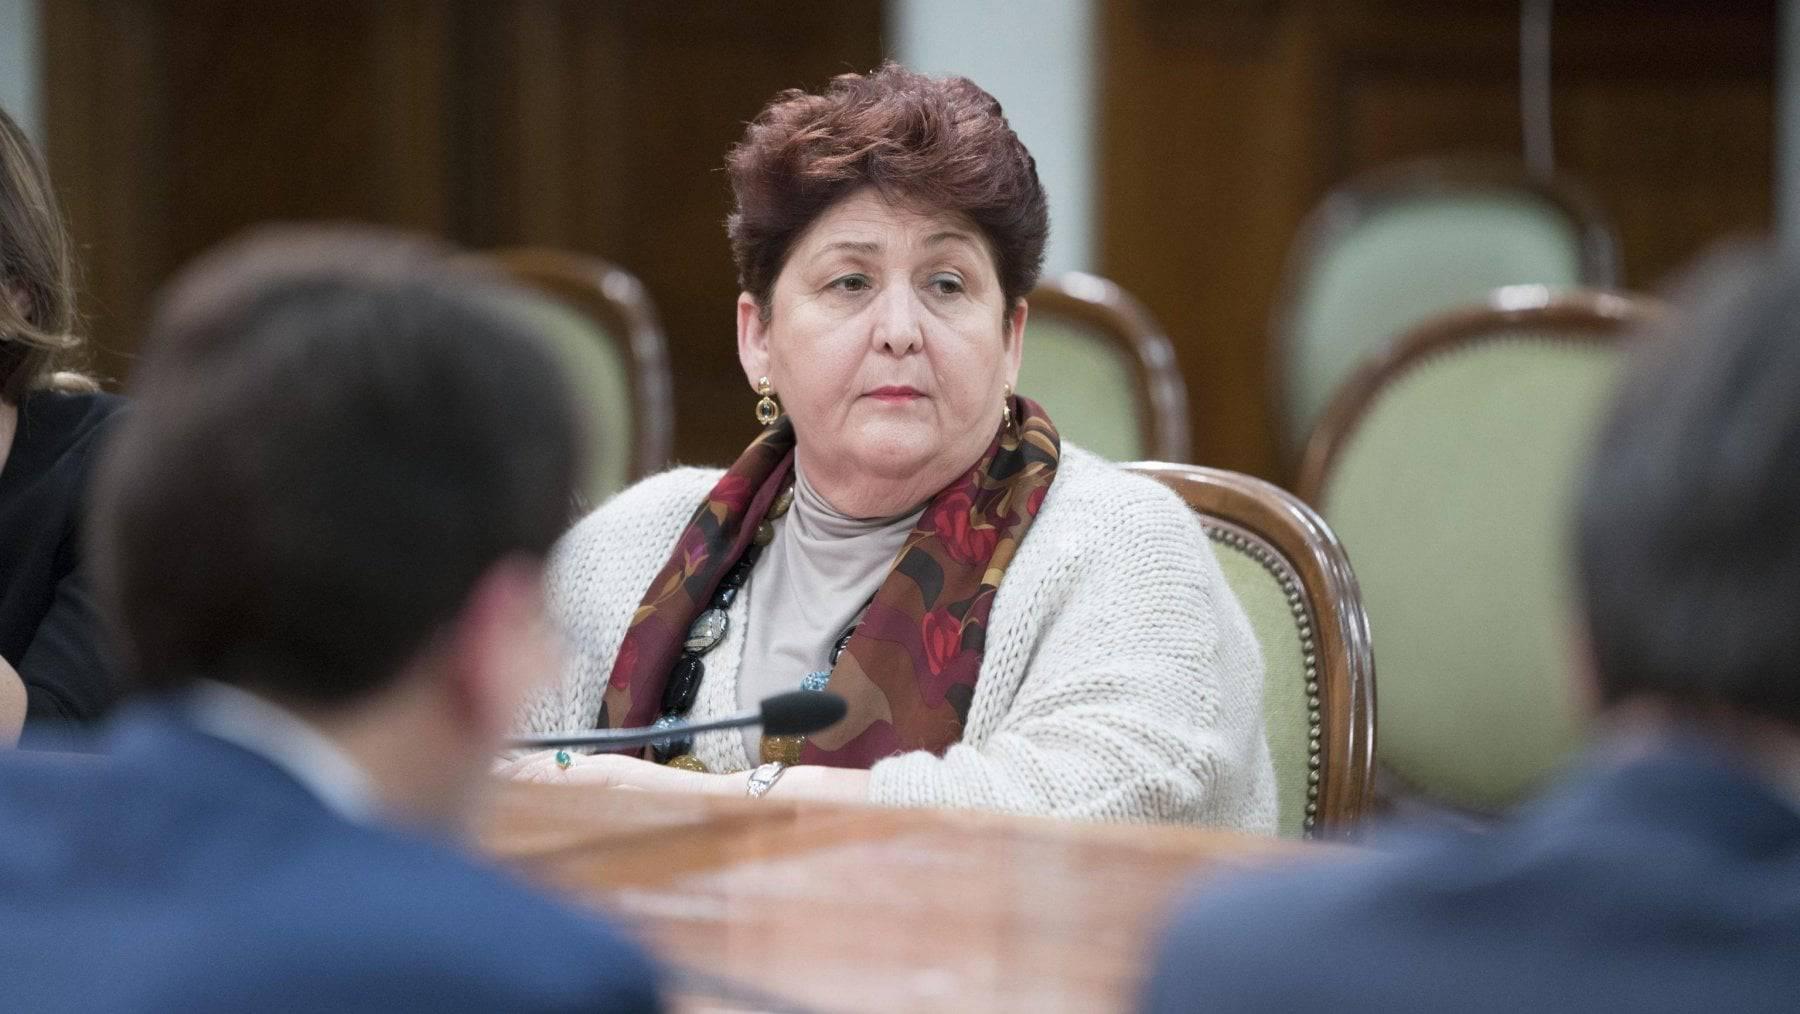 bellanova sanatoria migranti - Leggilo